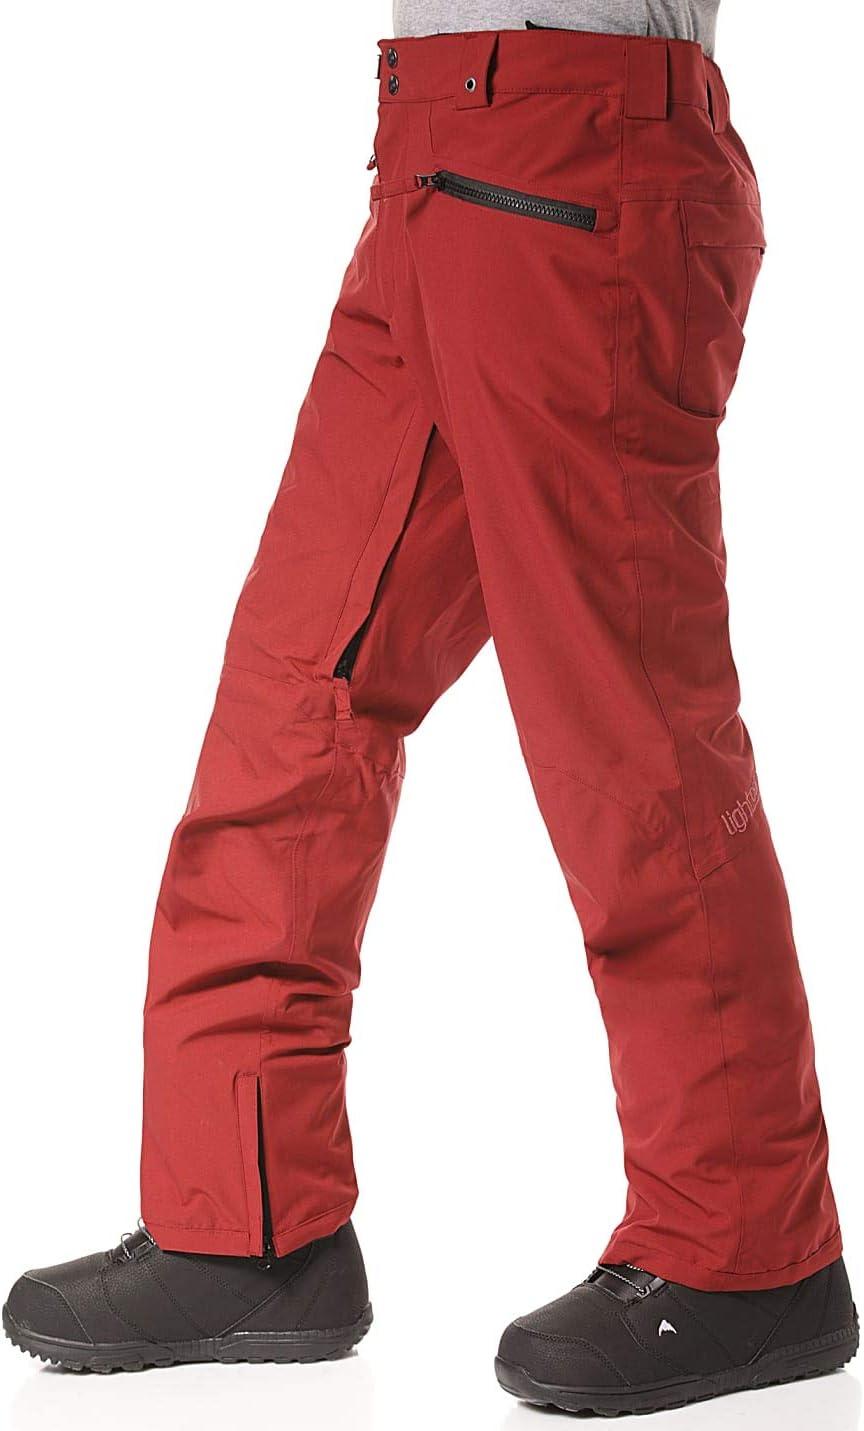 Light Moonshine Pantalon Mixte bordeaux